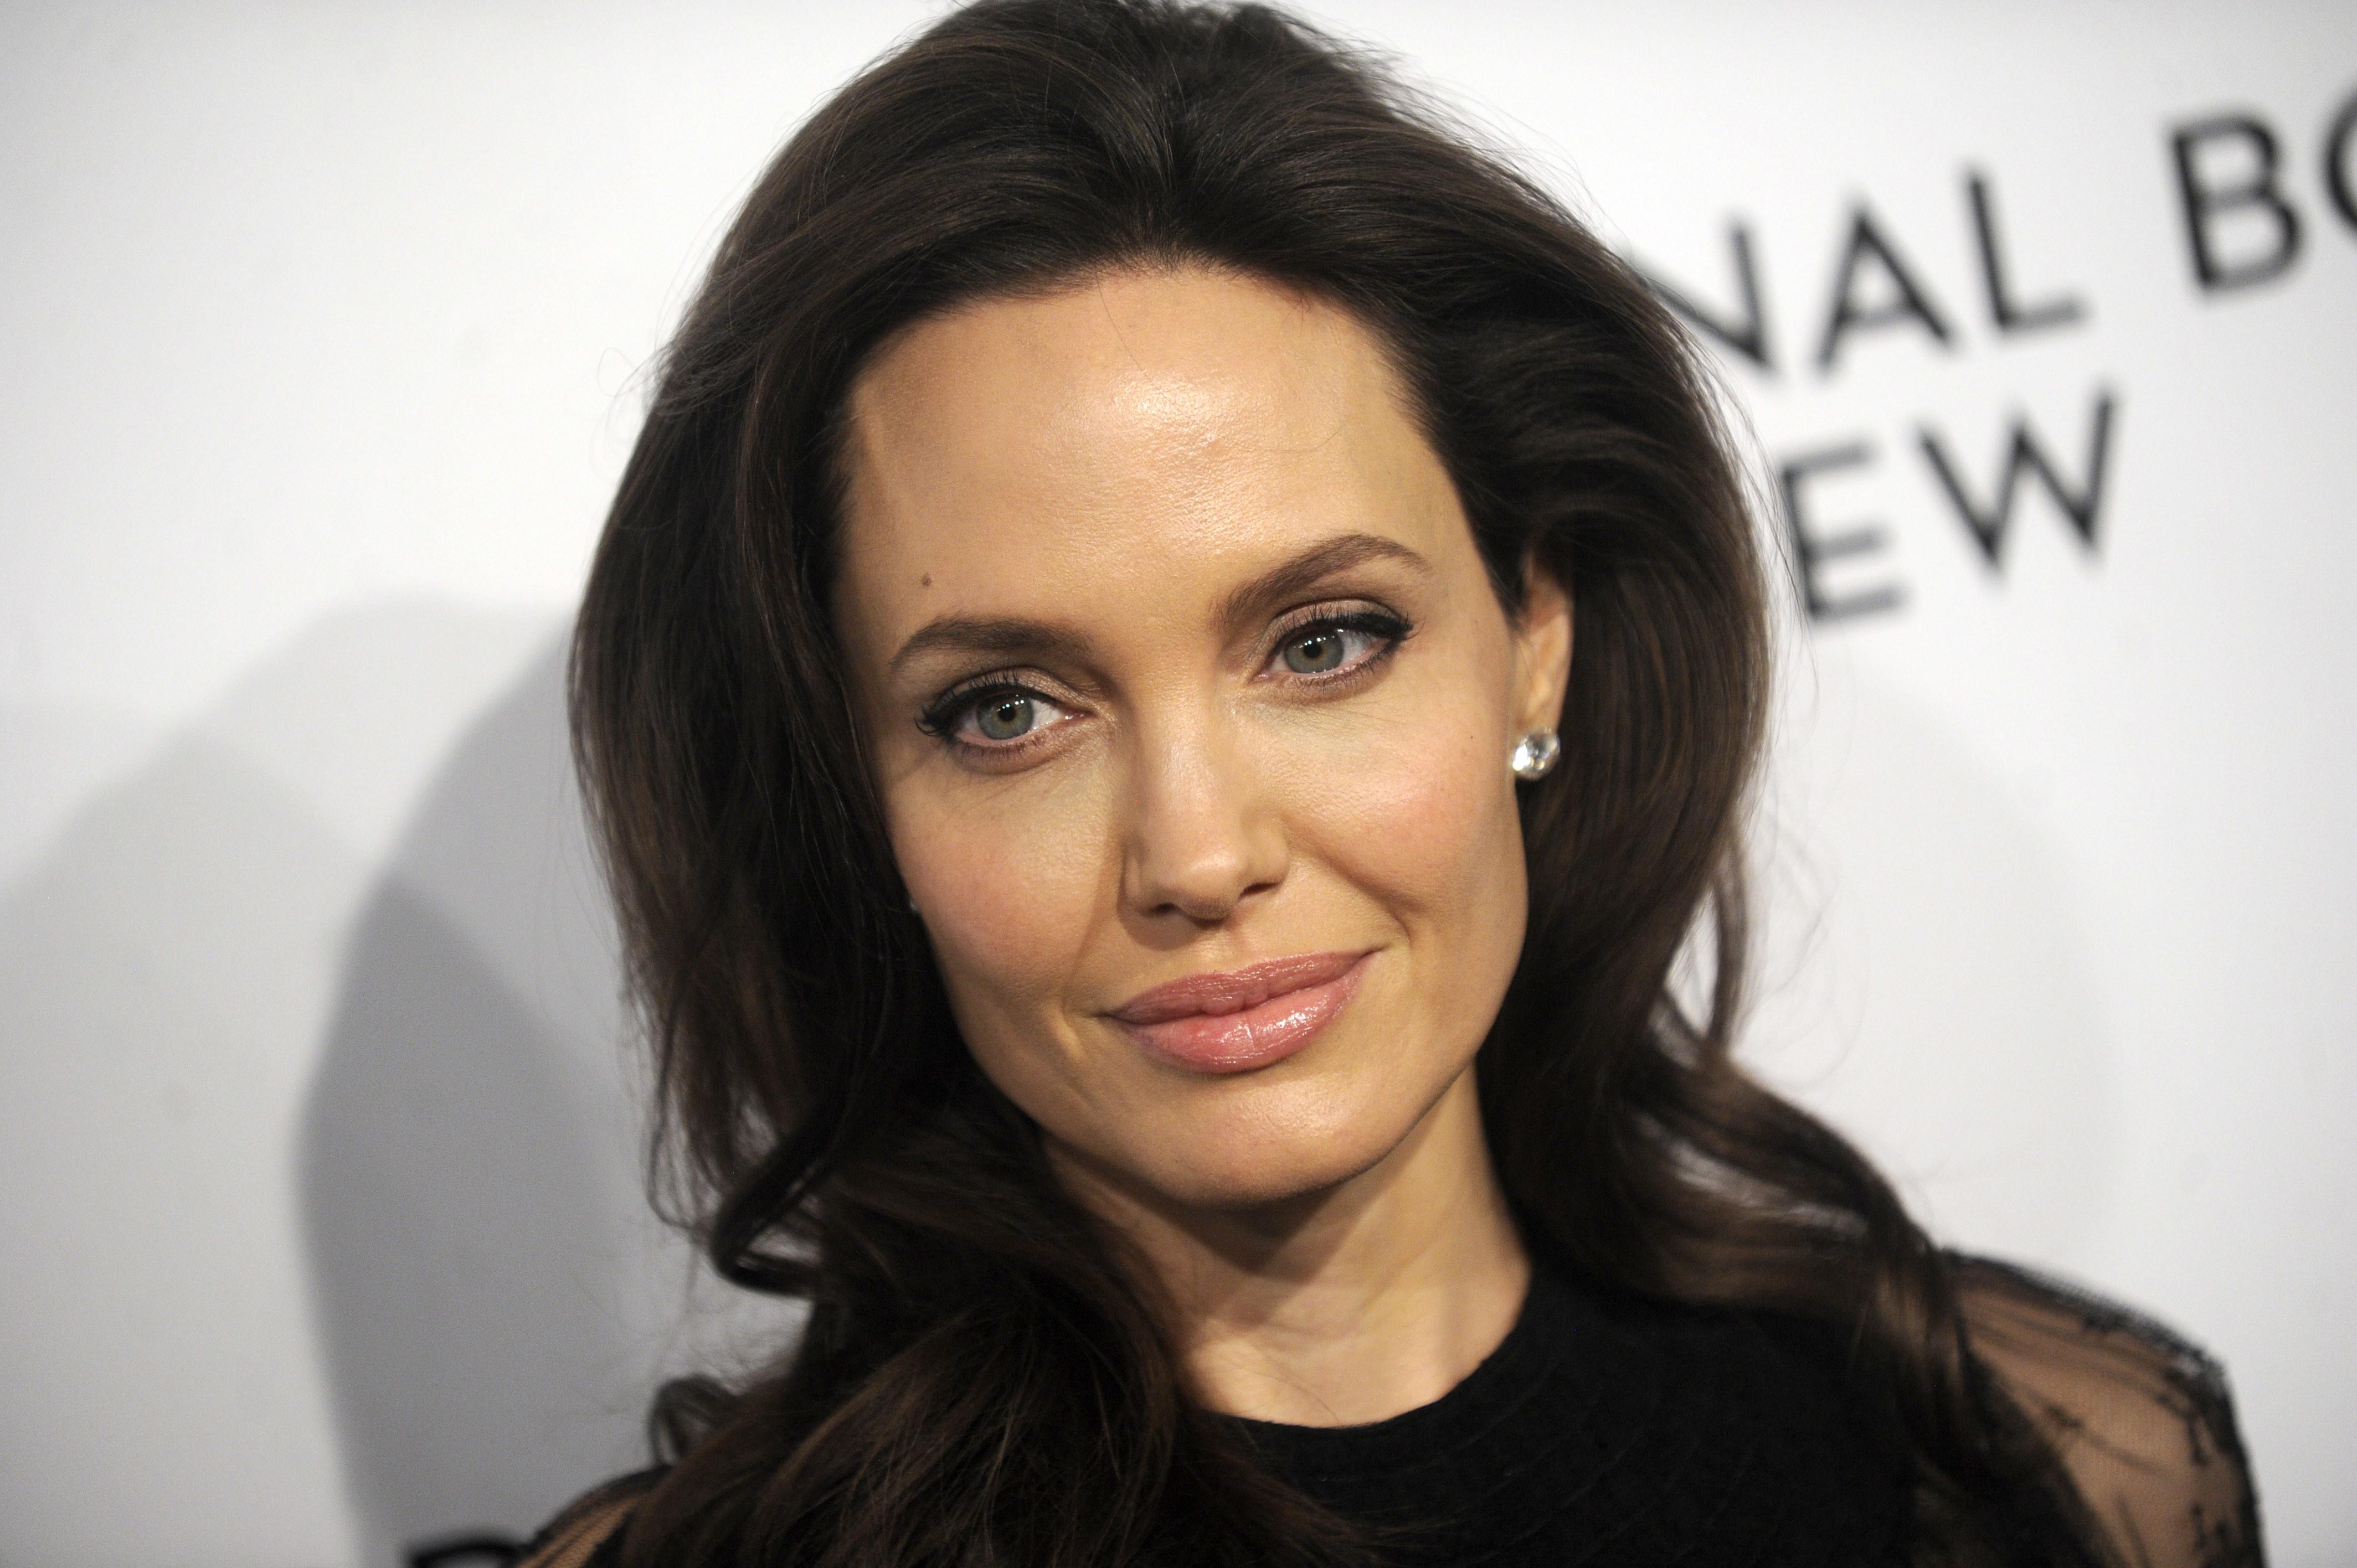 Анджелина Джоли сходила с детьми в Лувр анджелина джоли